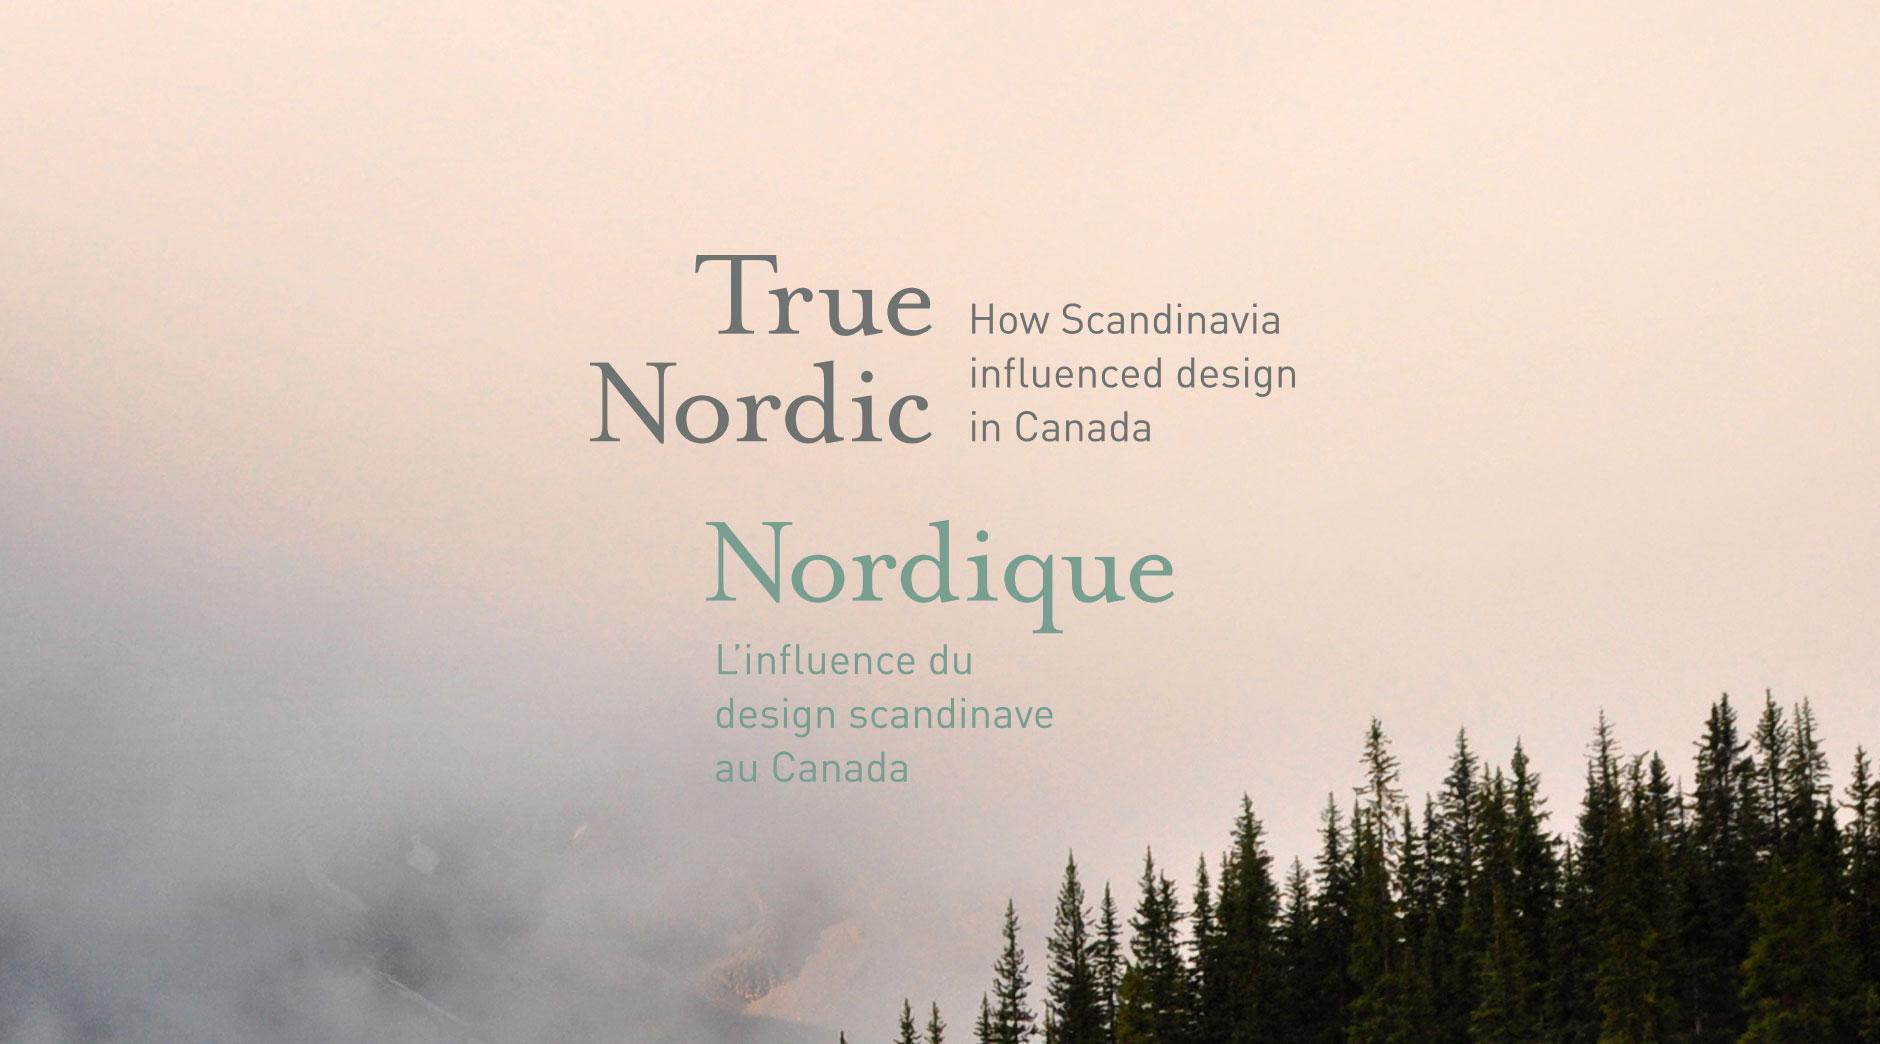 Gardiner Museum True Nordic